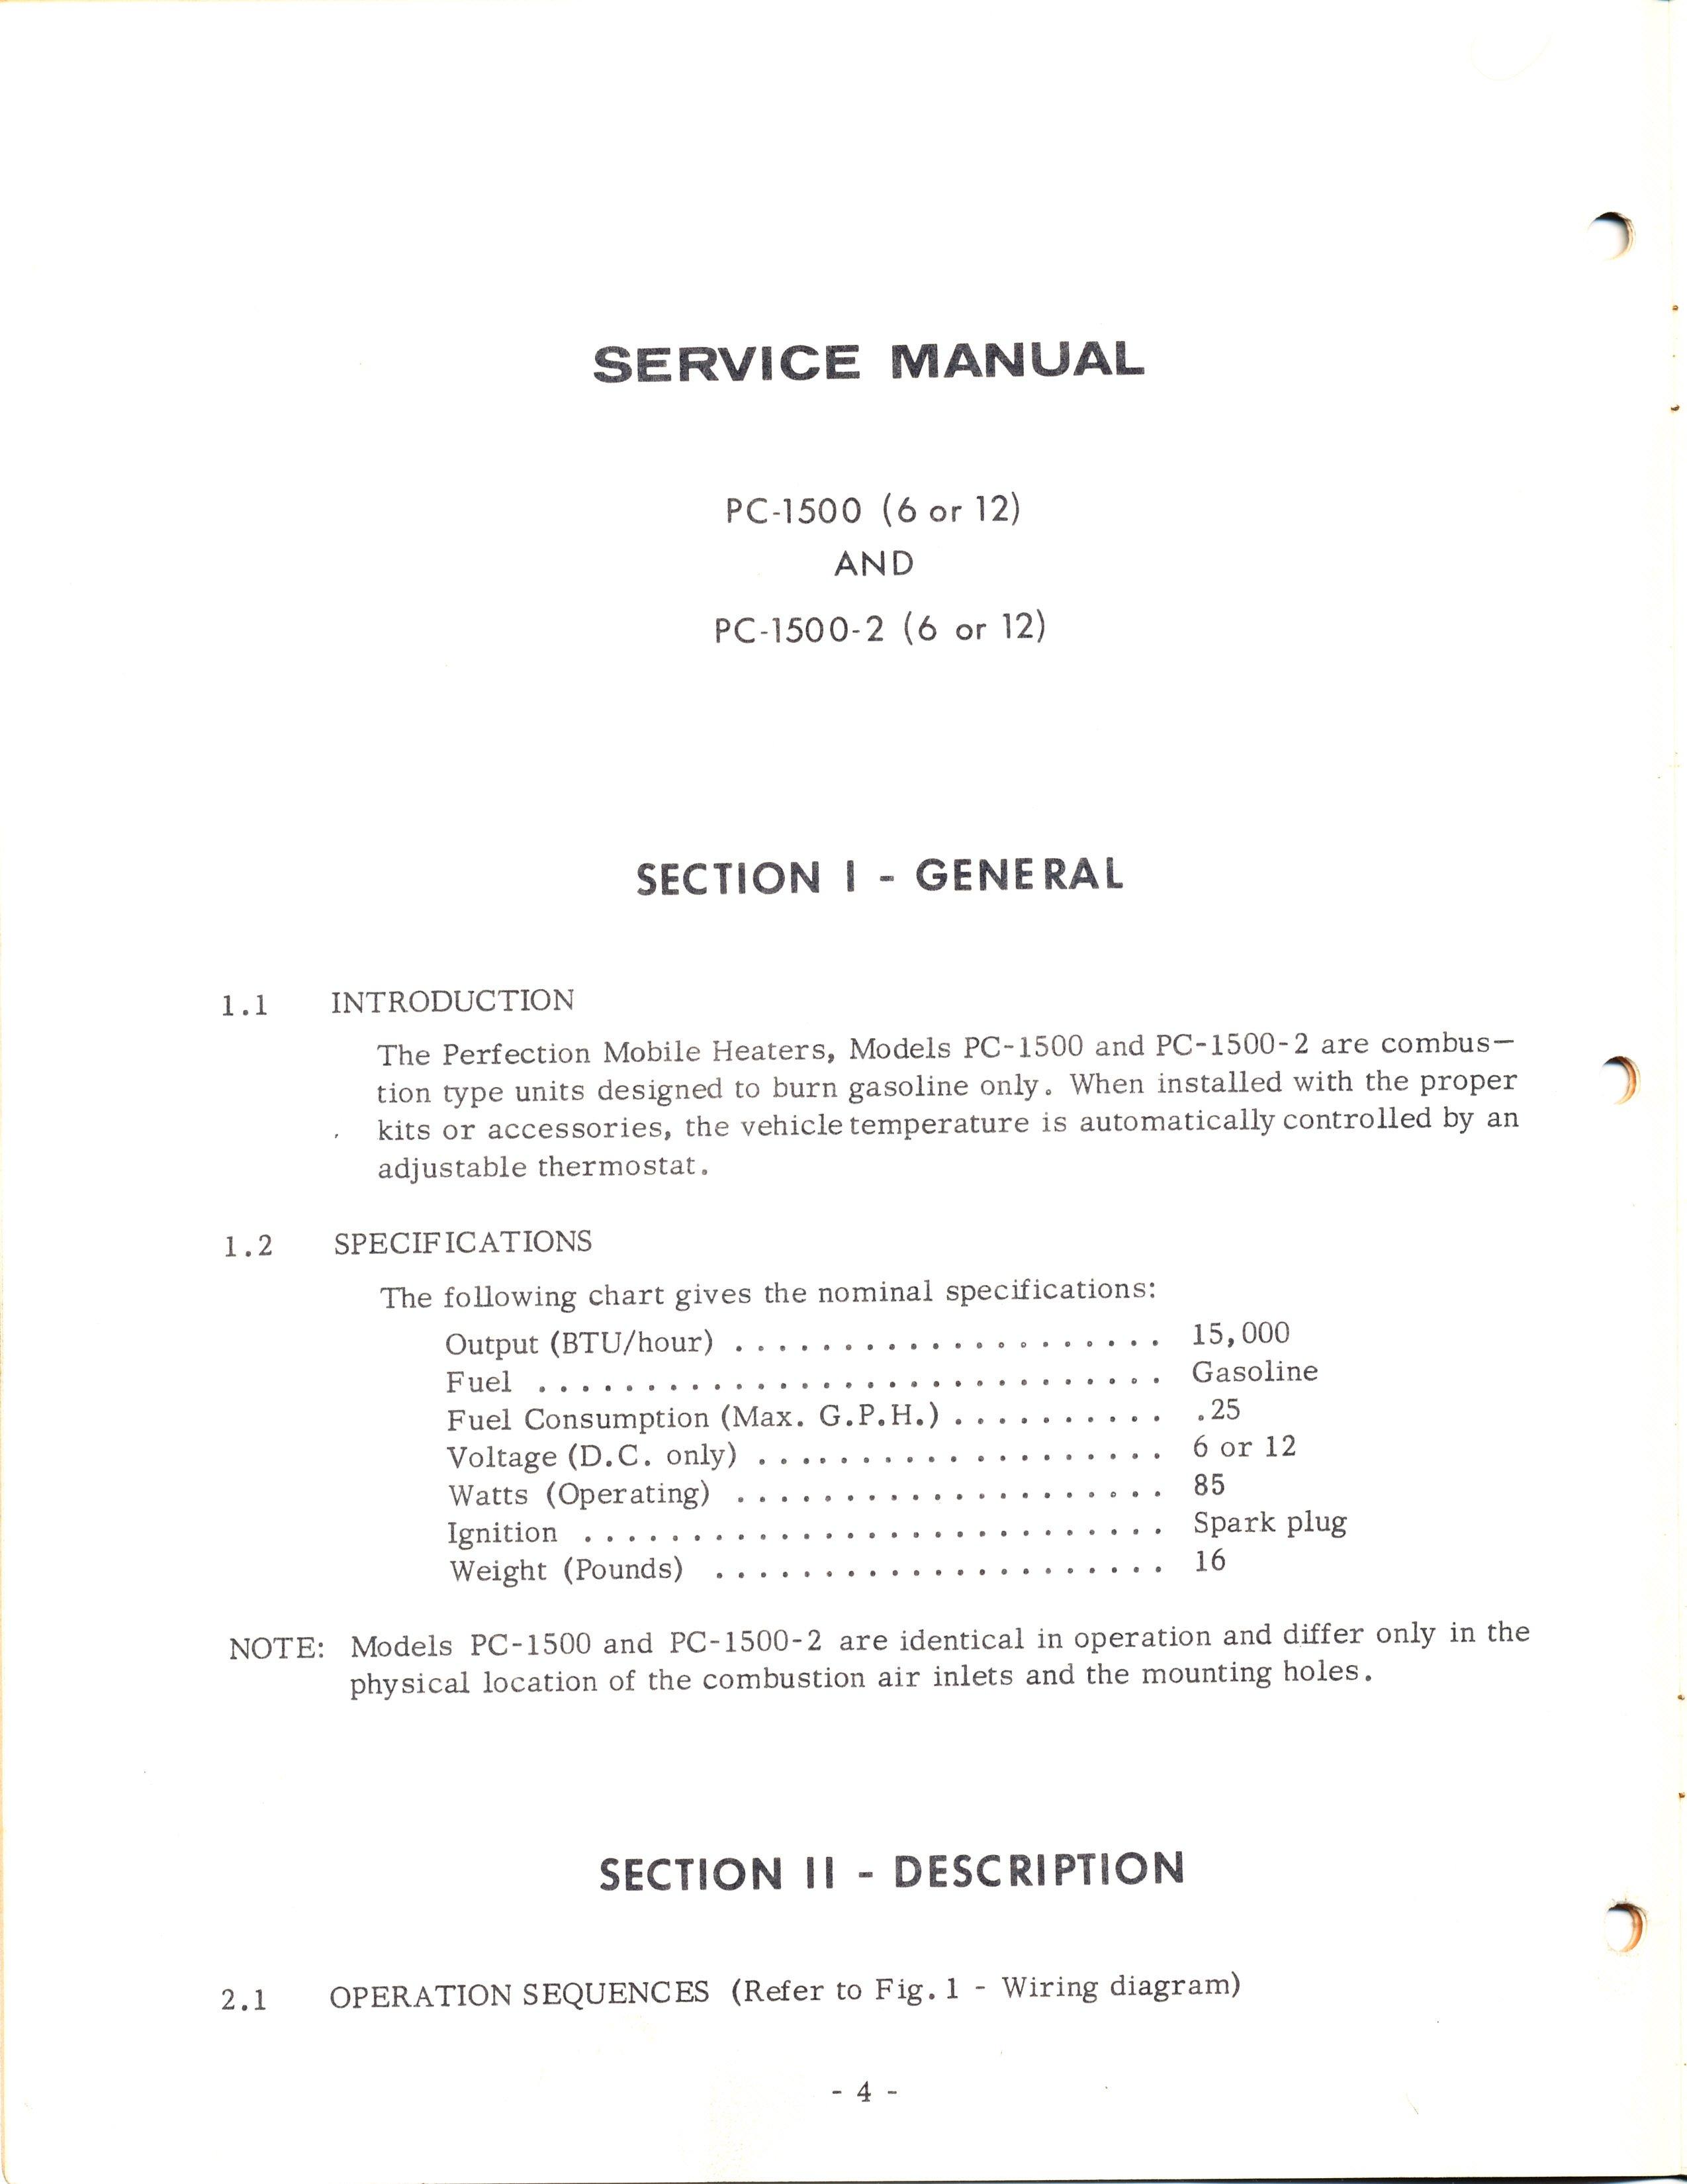 Pc Service Manual 2 Komatsu Pc75uu 1 Wiring Diagram Kenworth Truck Owner All Array Thesamba Com Perfection 1500 Type And 3 Gas Rh